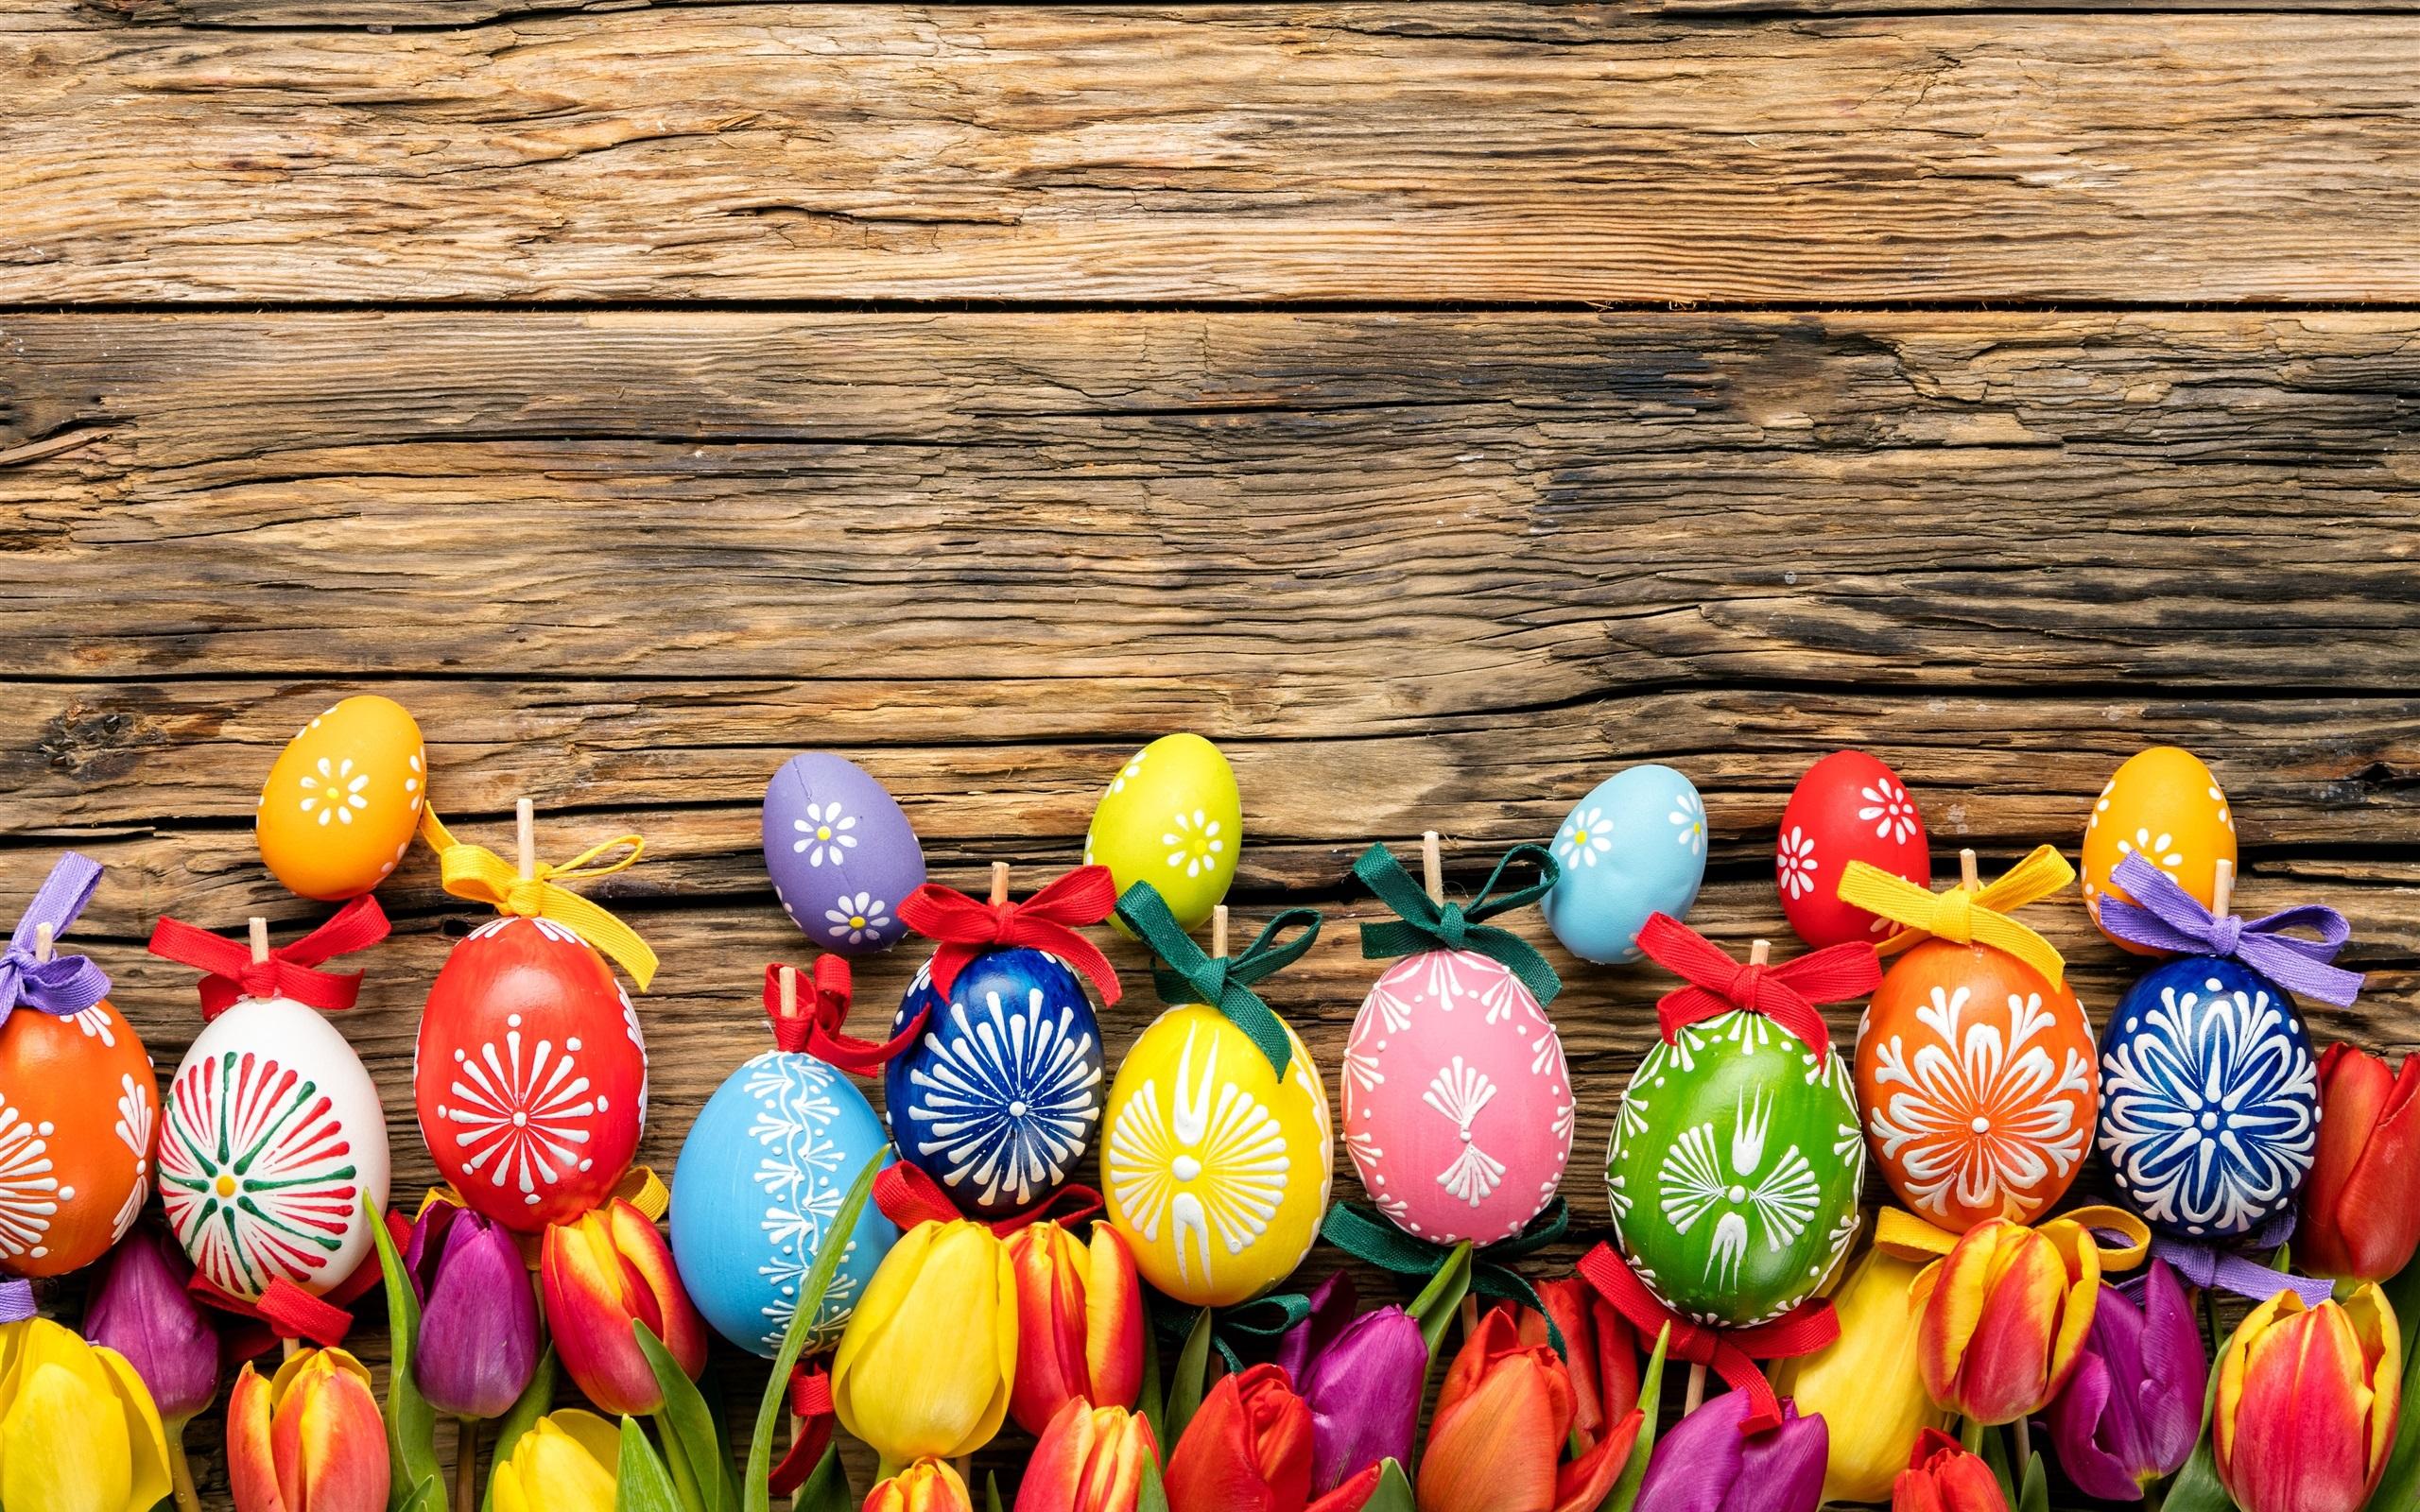 Fondos De Pantalla Fondo De Tablero De Madera De Colores: Fondos De Pantalla Feliz Pascua, Huevos De Colores